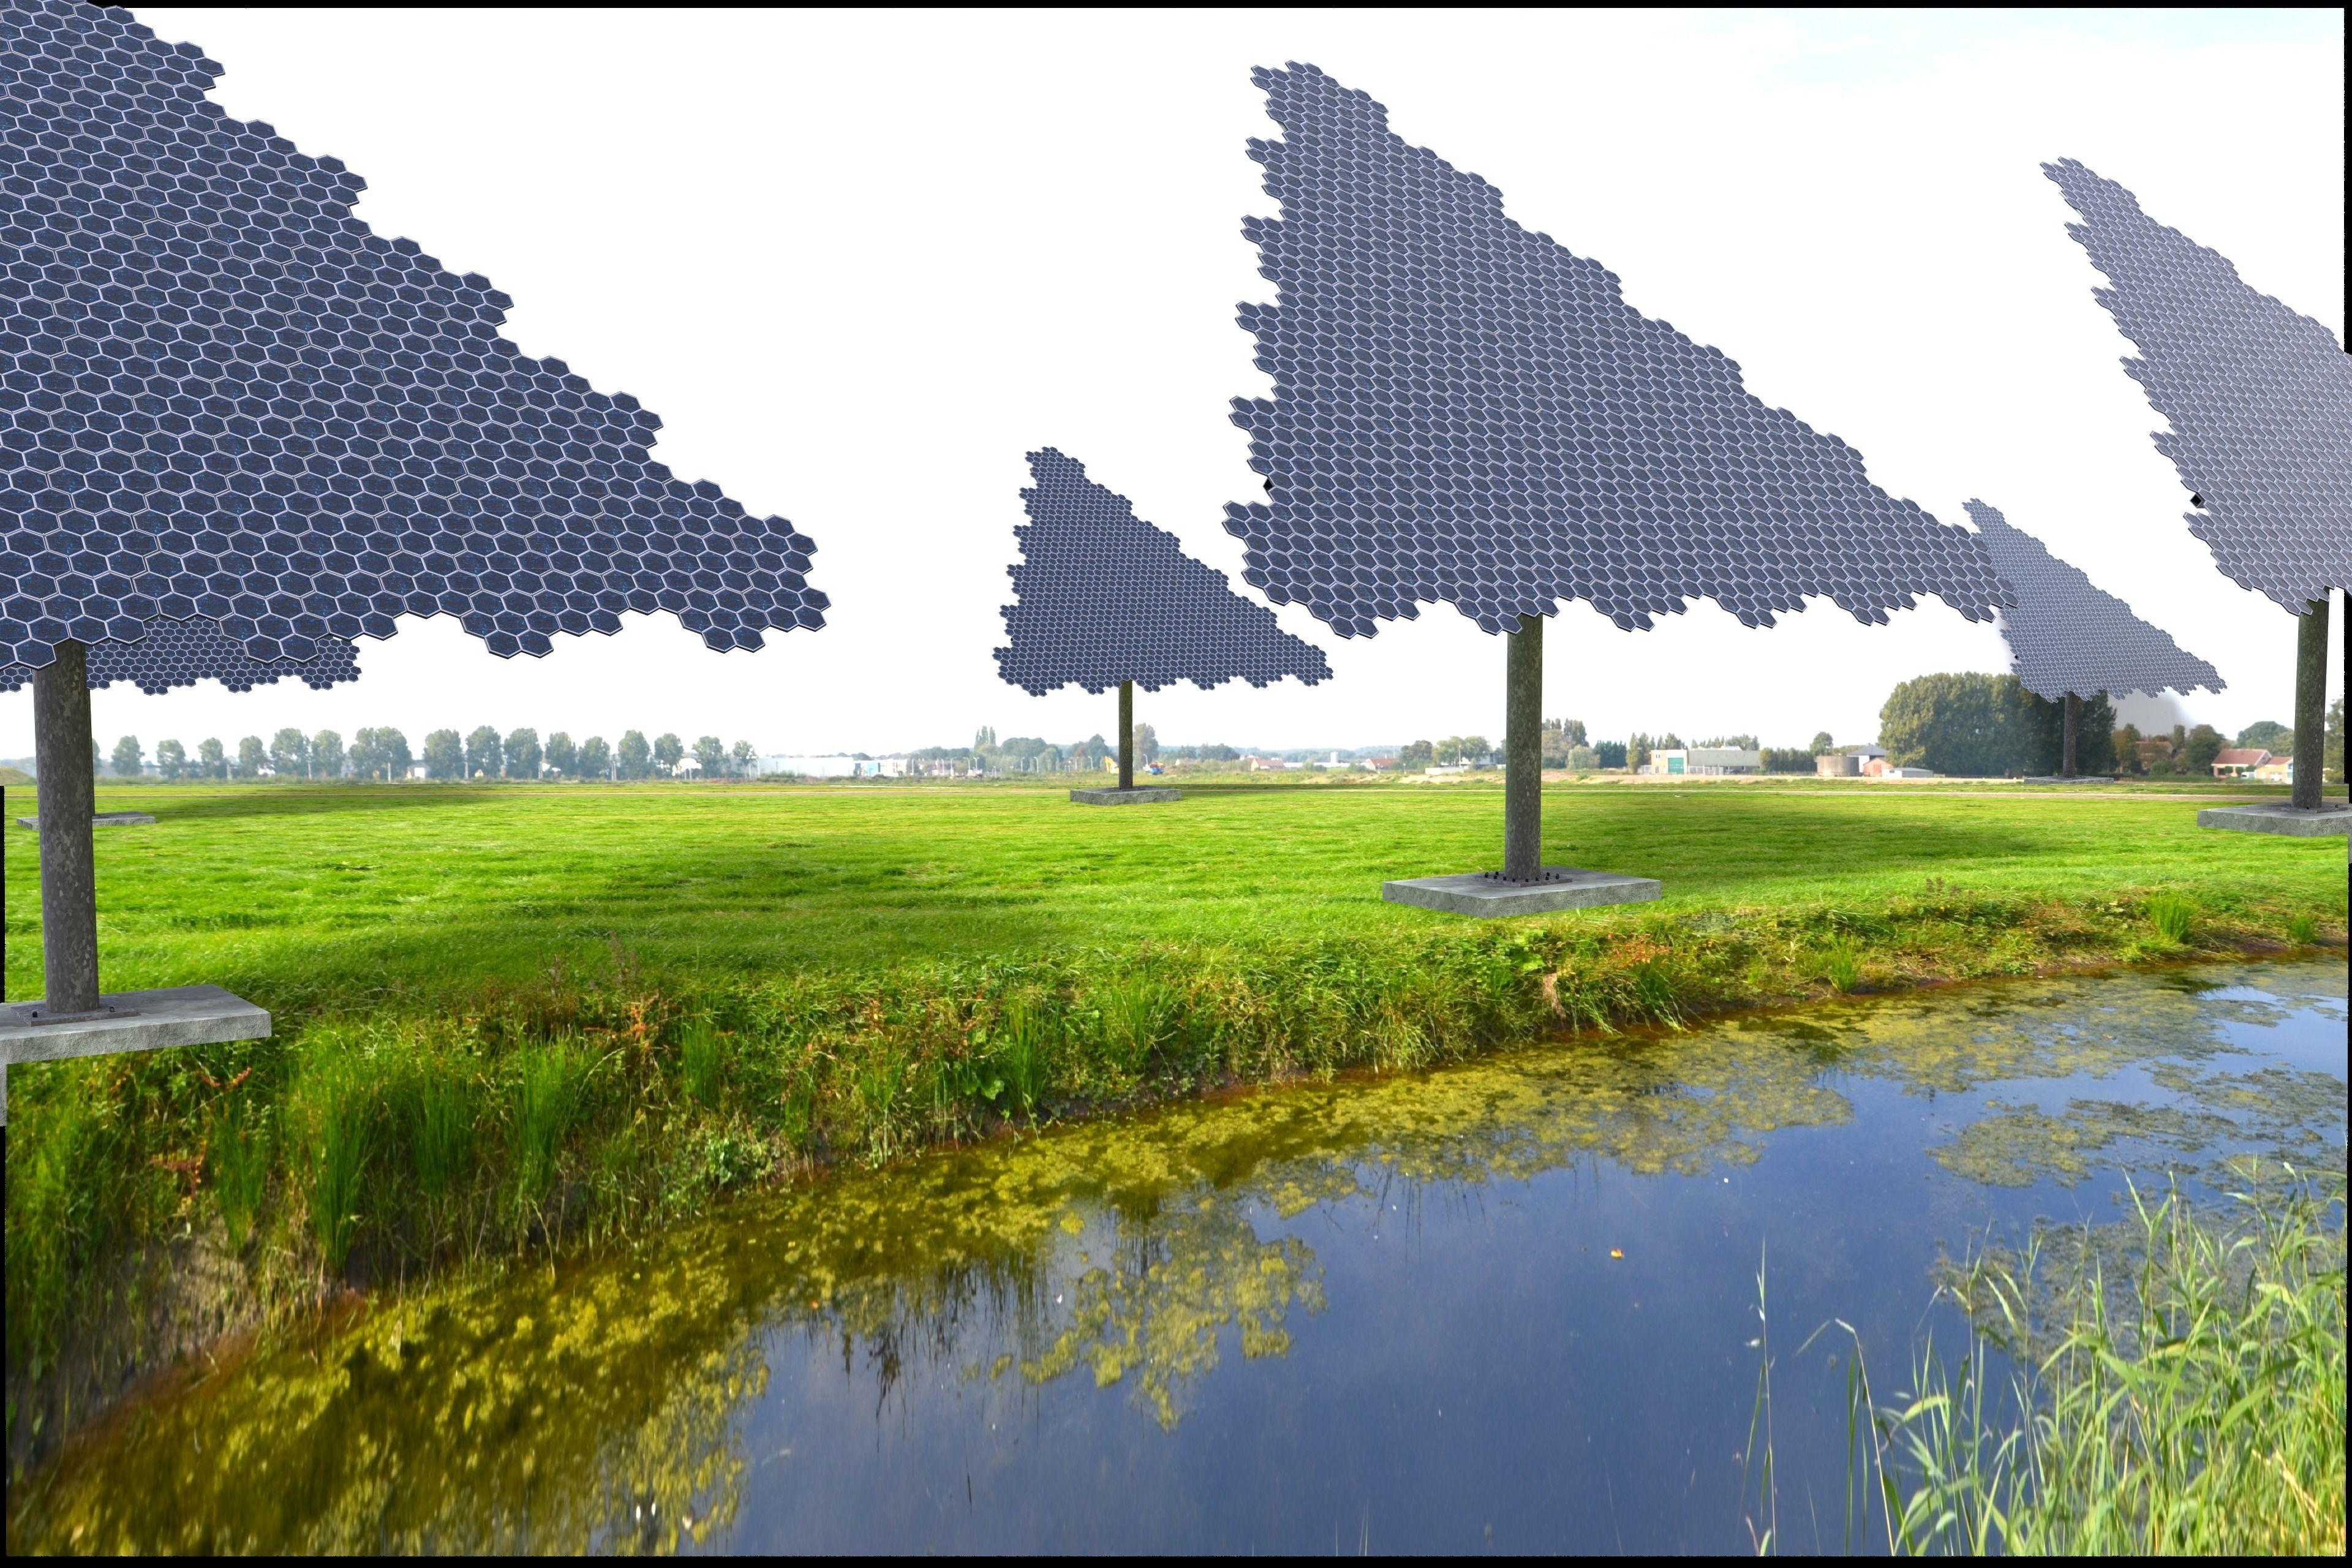 Hexagonal sun following pv solar panel array